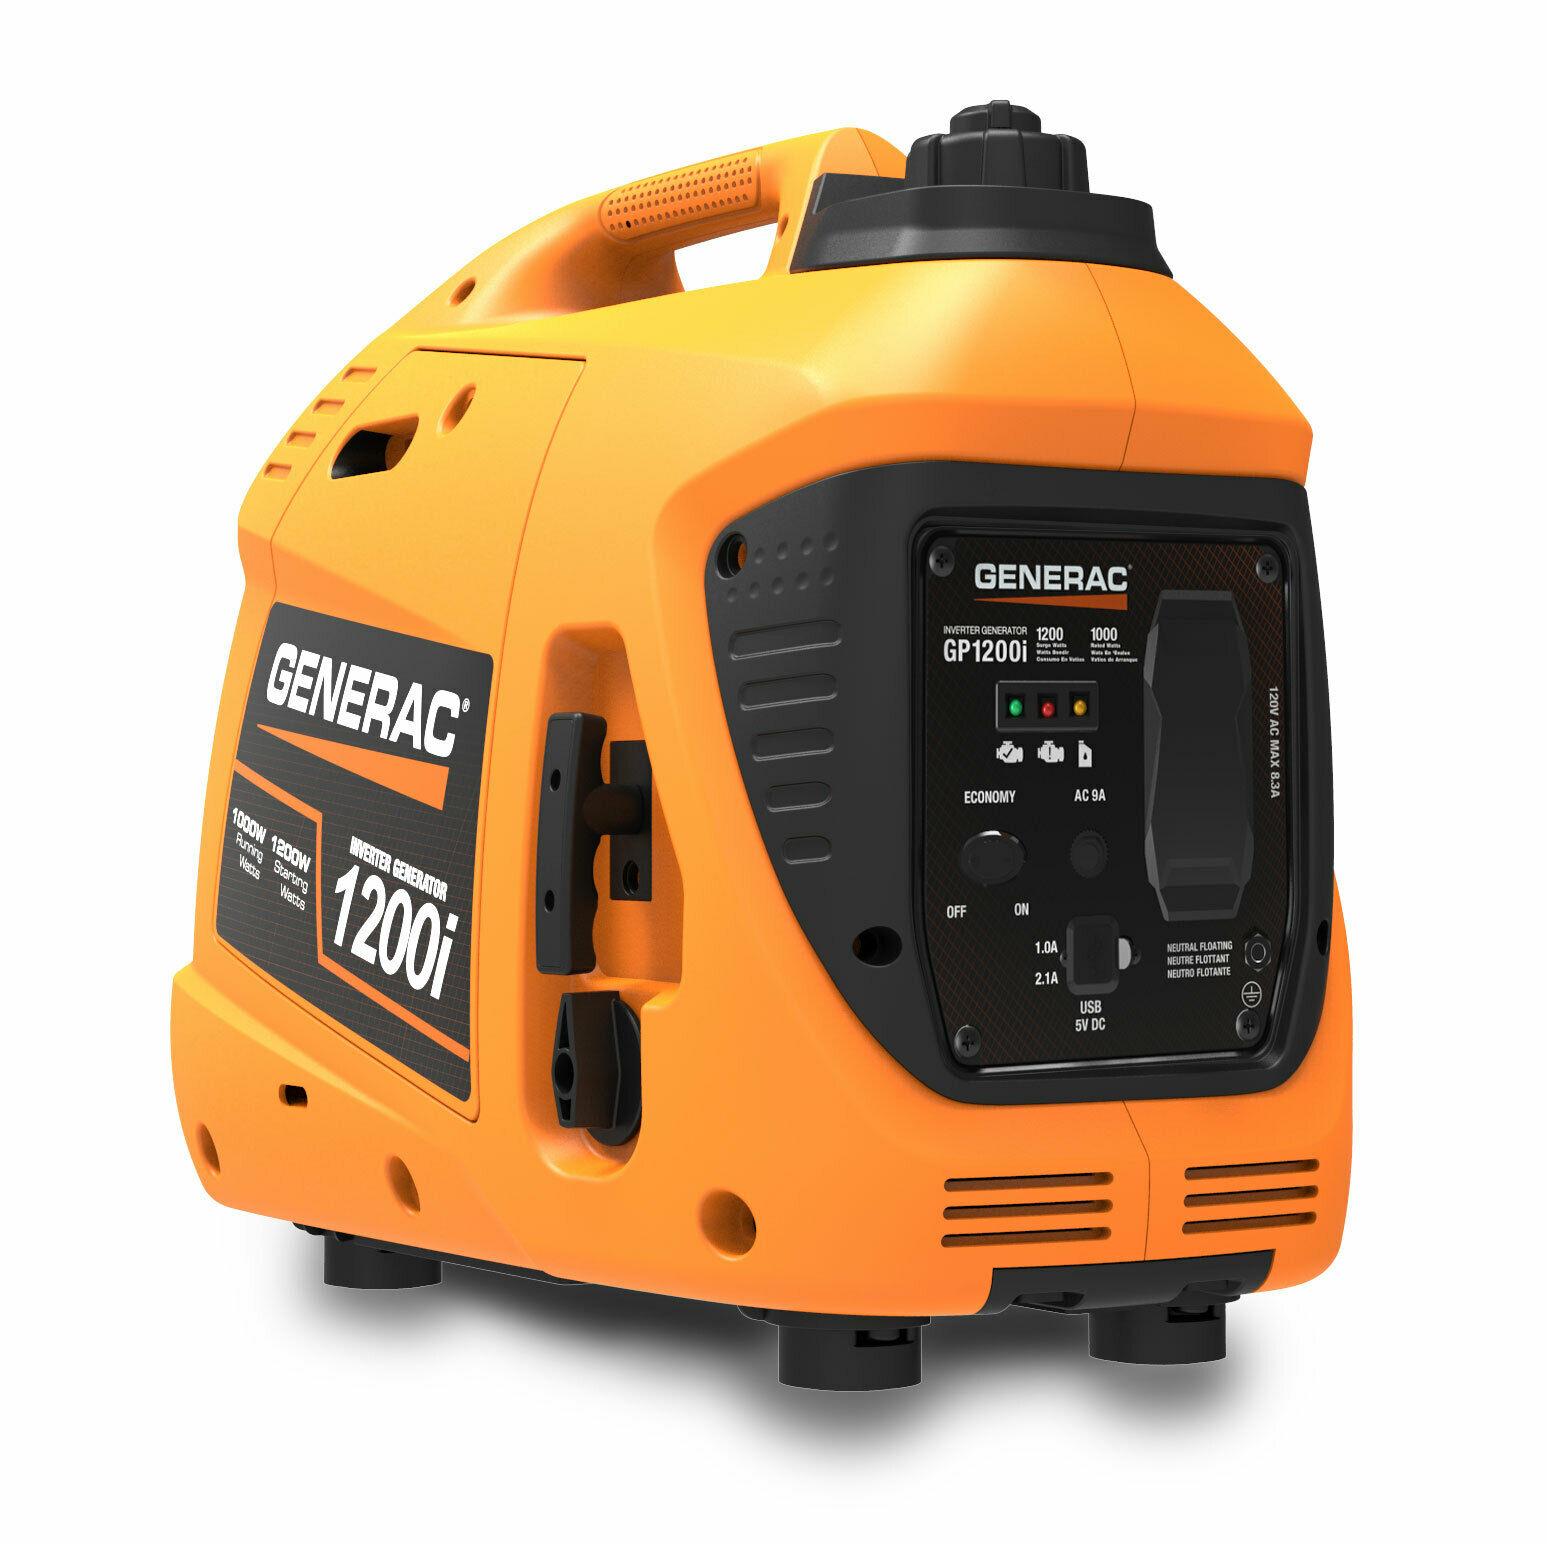 Generac 7671 Gp1200i 1200 Watt Portable Inverter Generator 49 State Csa For Sale Online